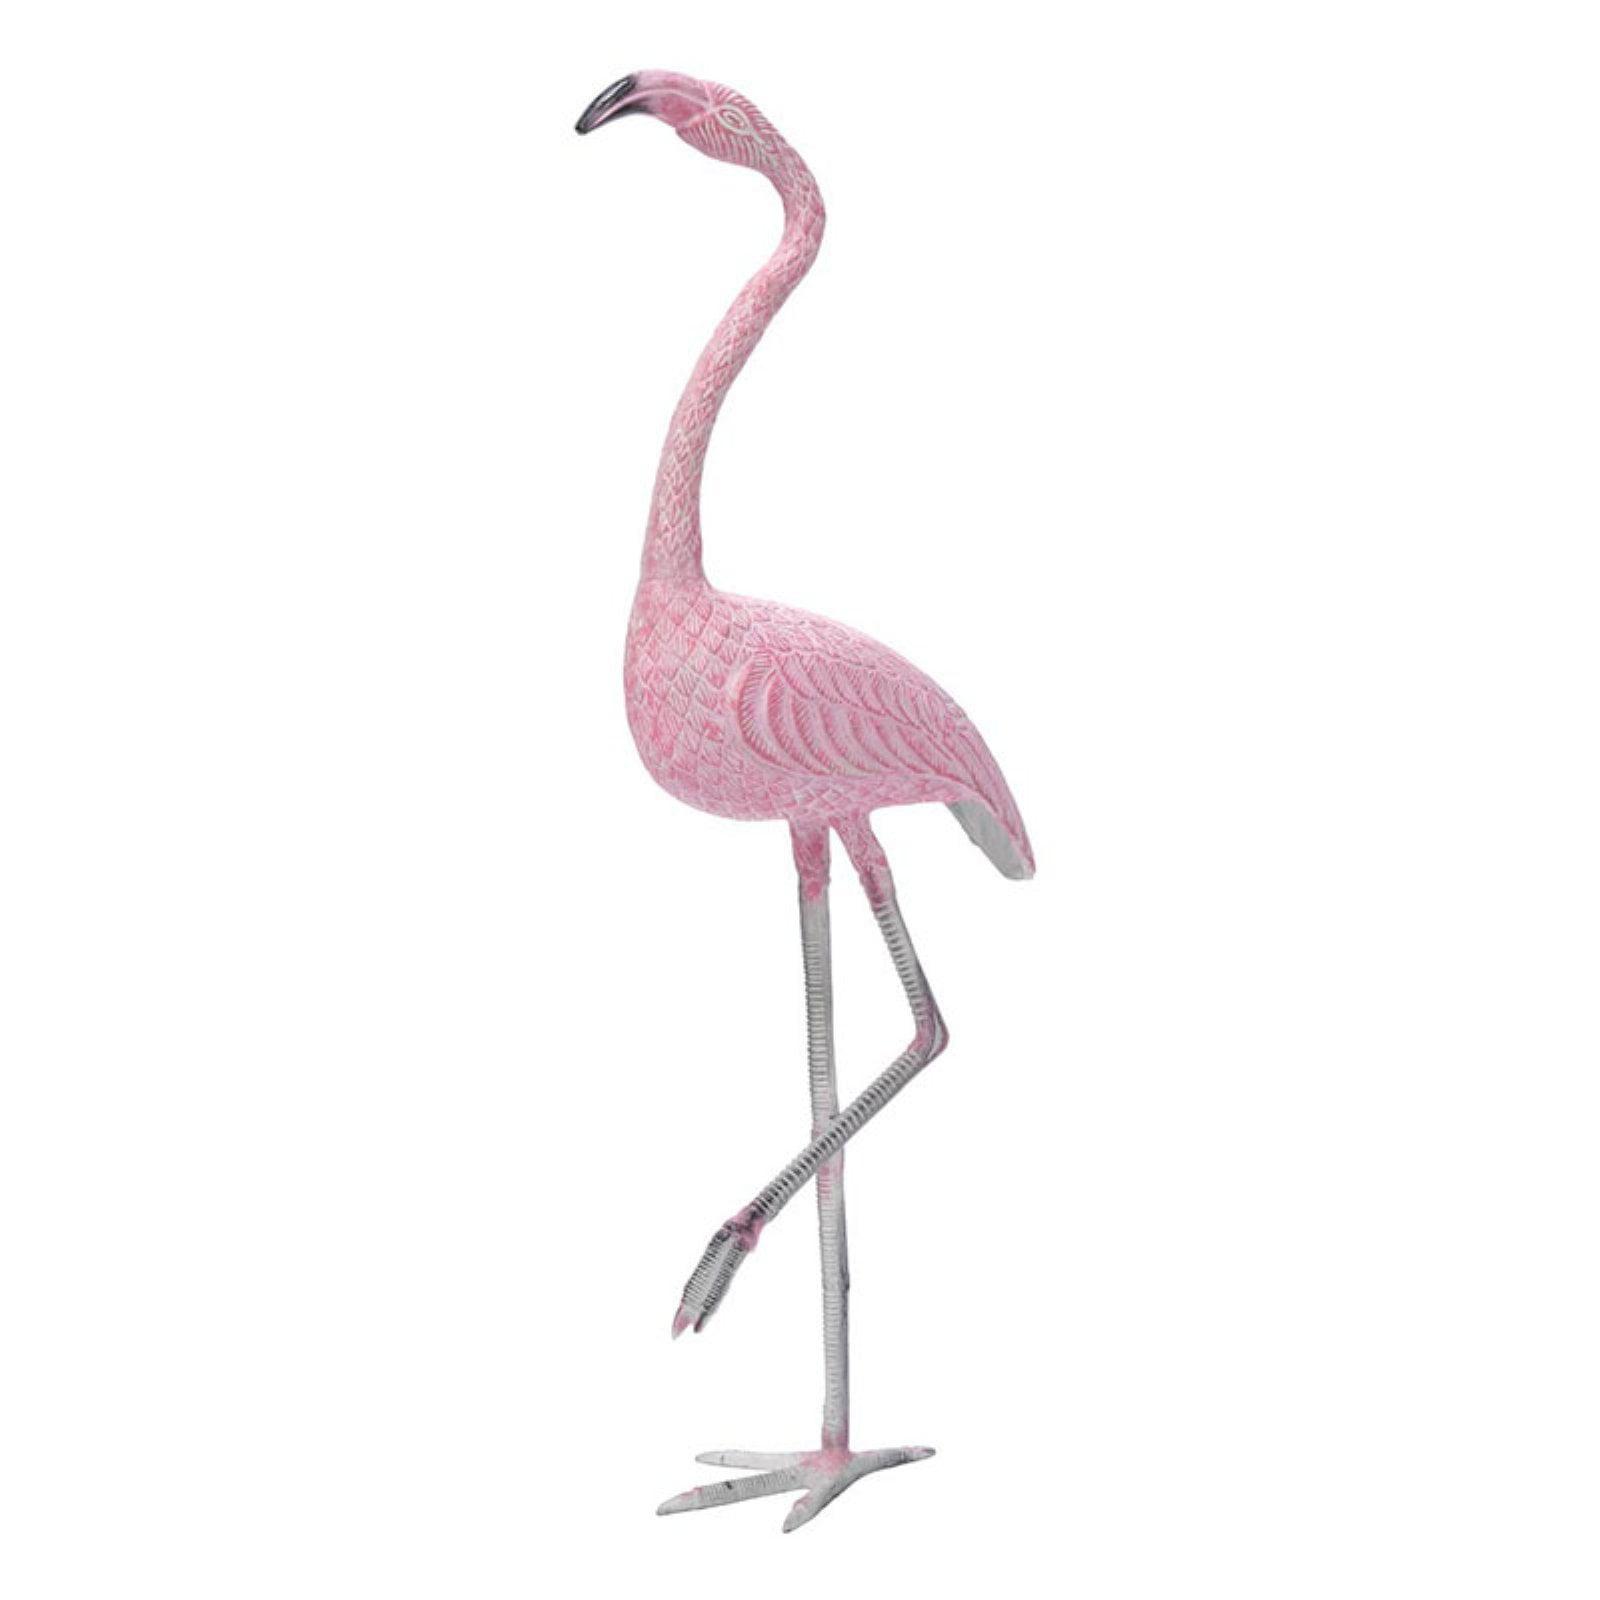 Achla Designs American Flamingo 36.75 in. Garden Statue by Minuteman/Achla Designs